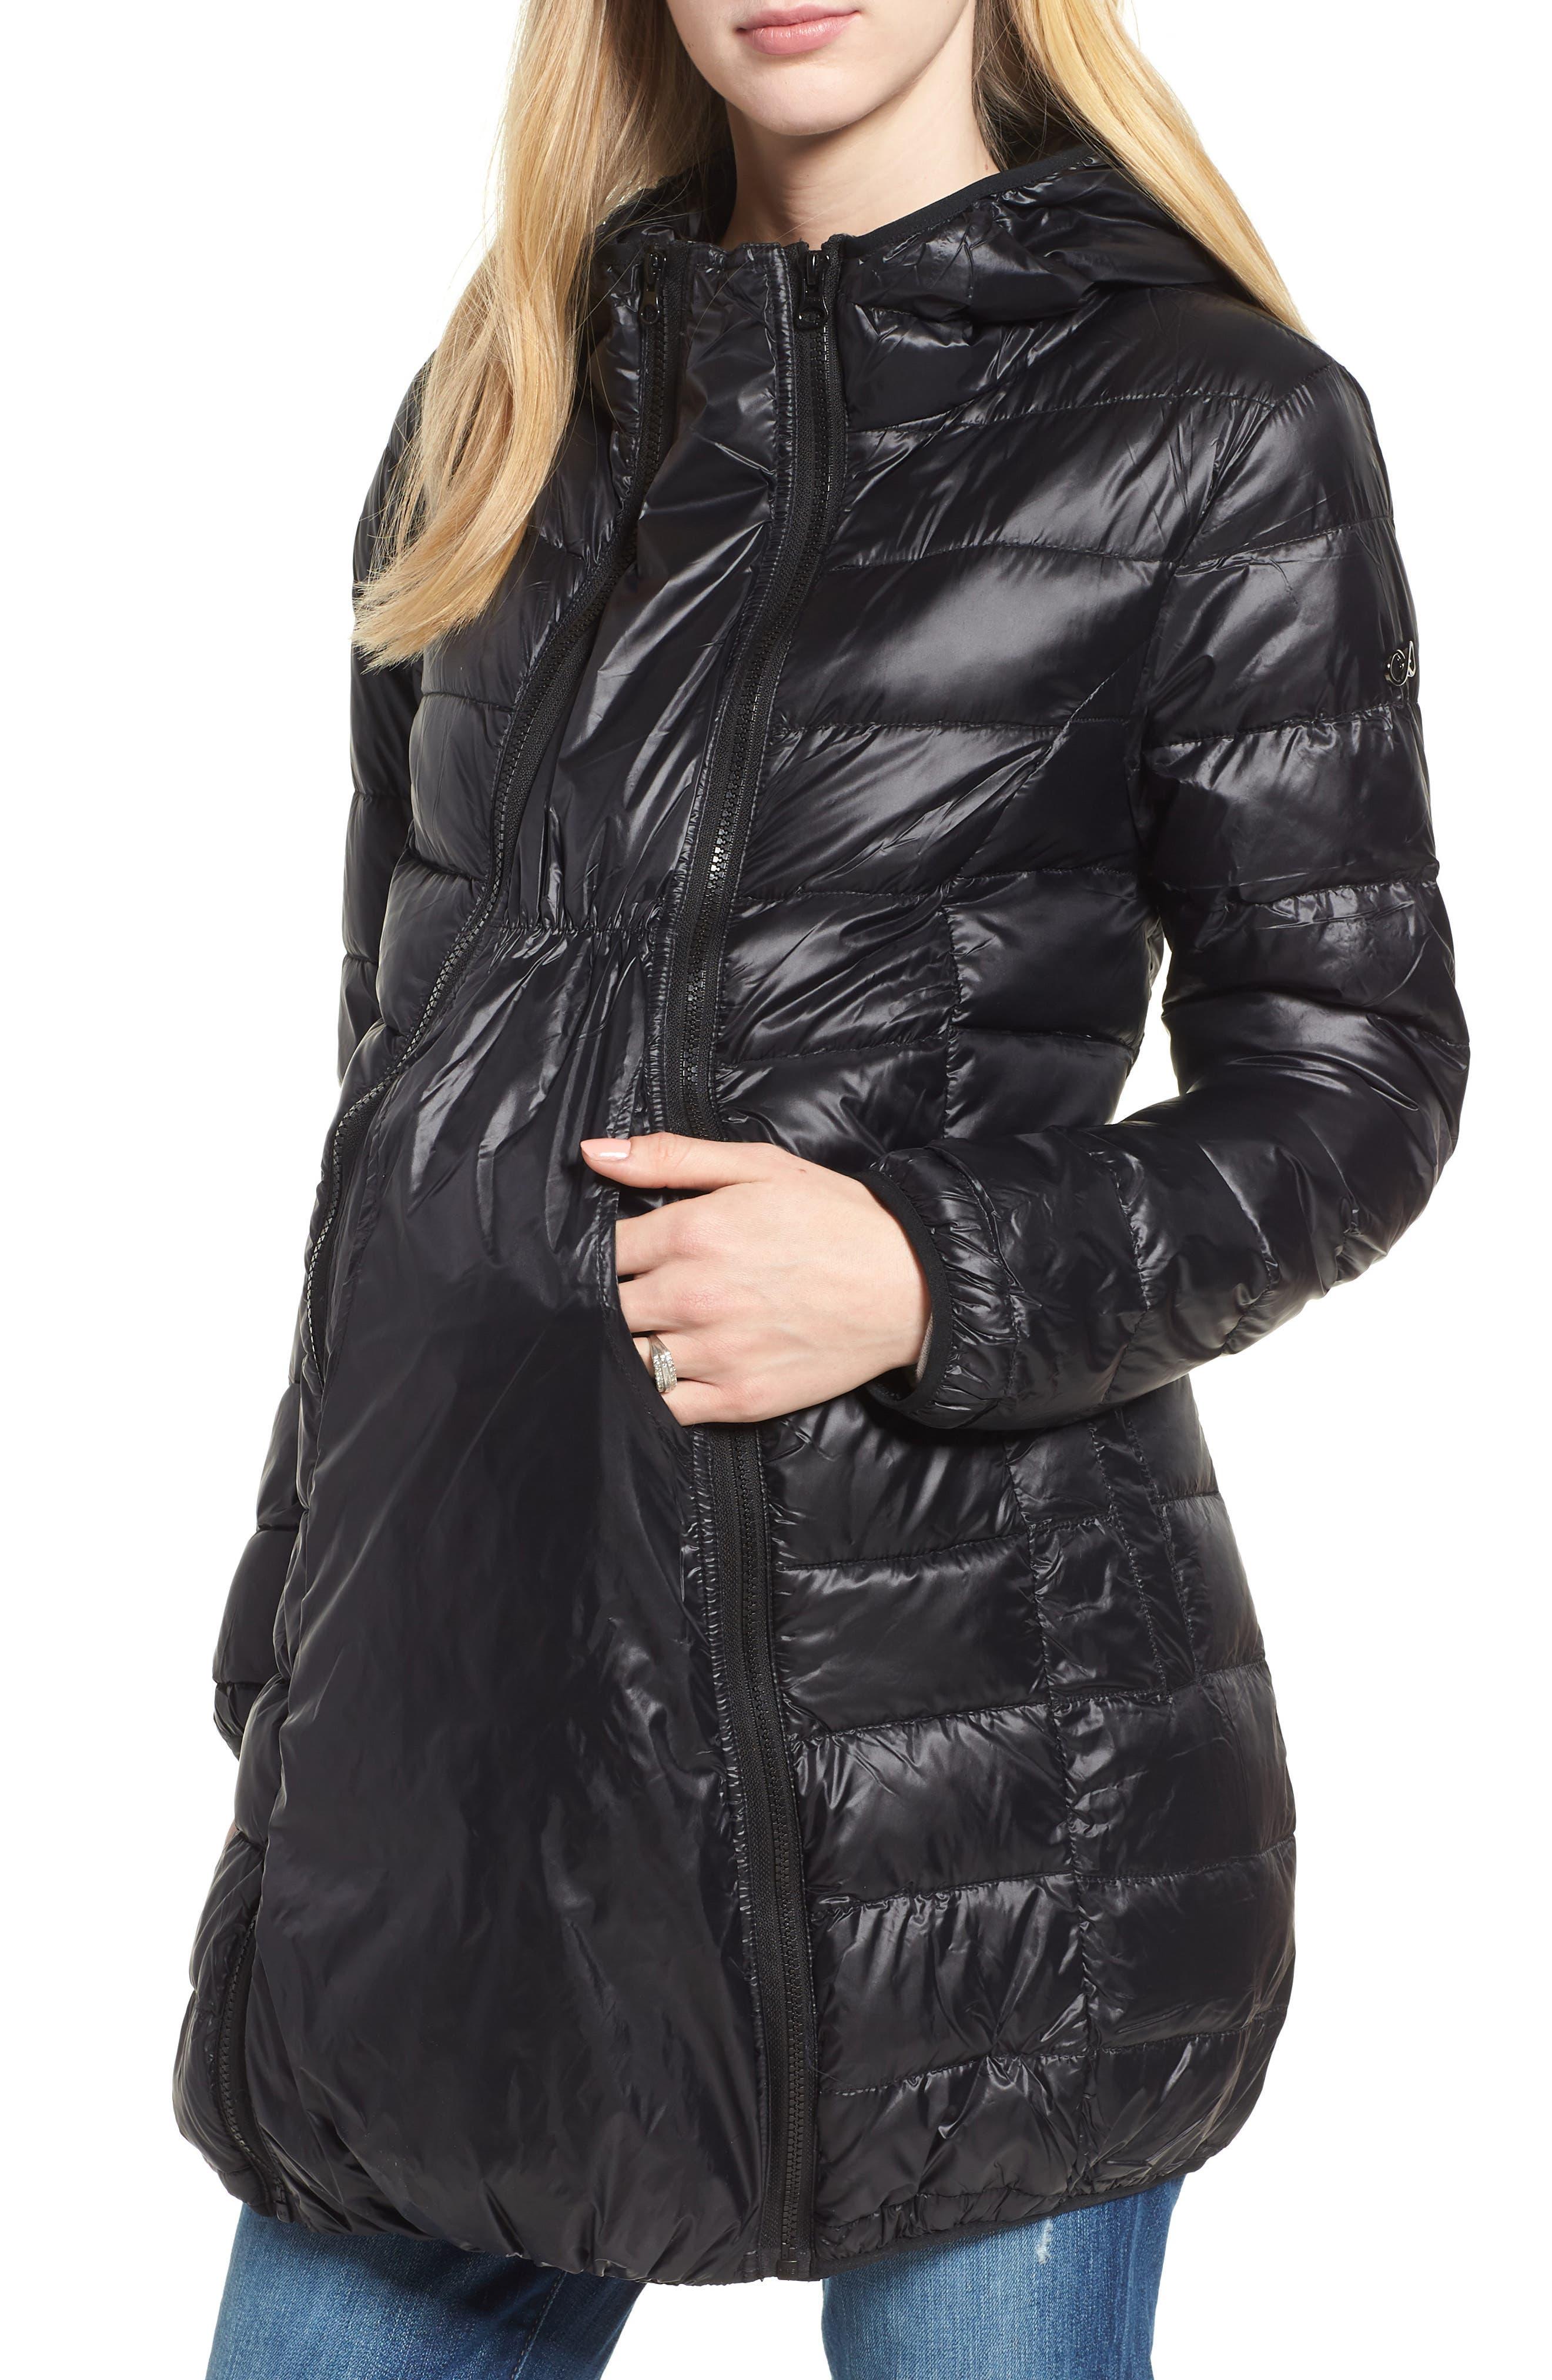 MODERN ETERNITY, Lightweight Down 3-in-1 Maternity/Nursing Jacket, Main thumbnail 1, color, BLACK